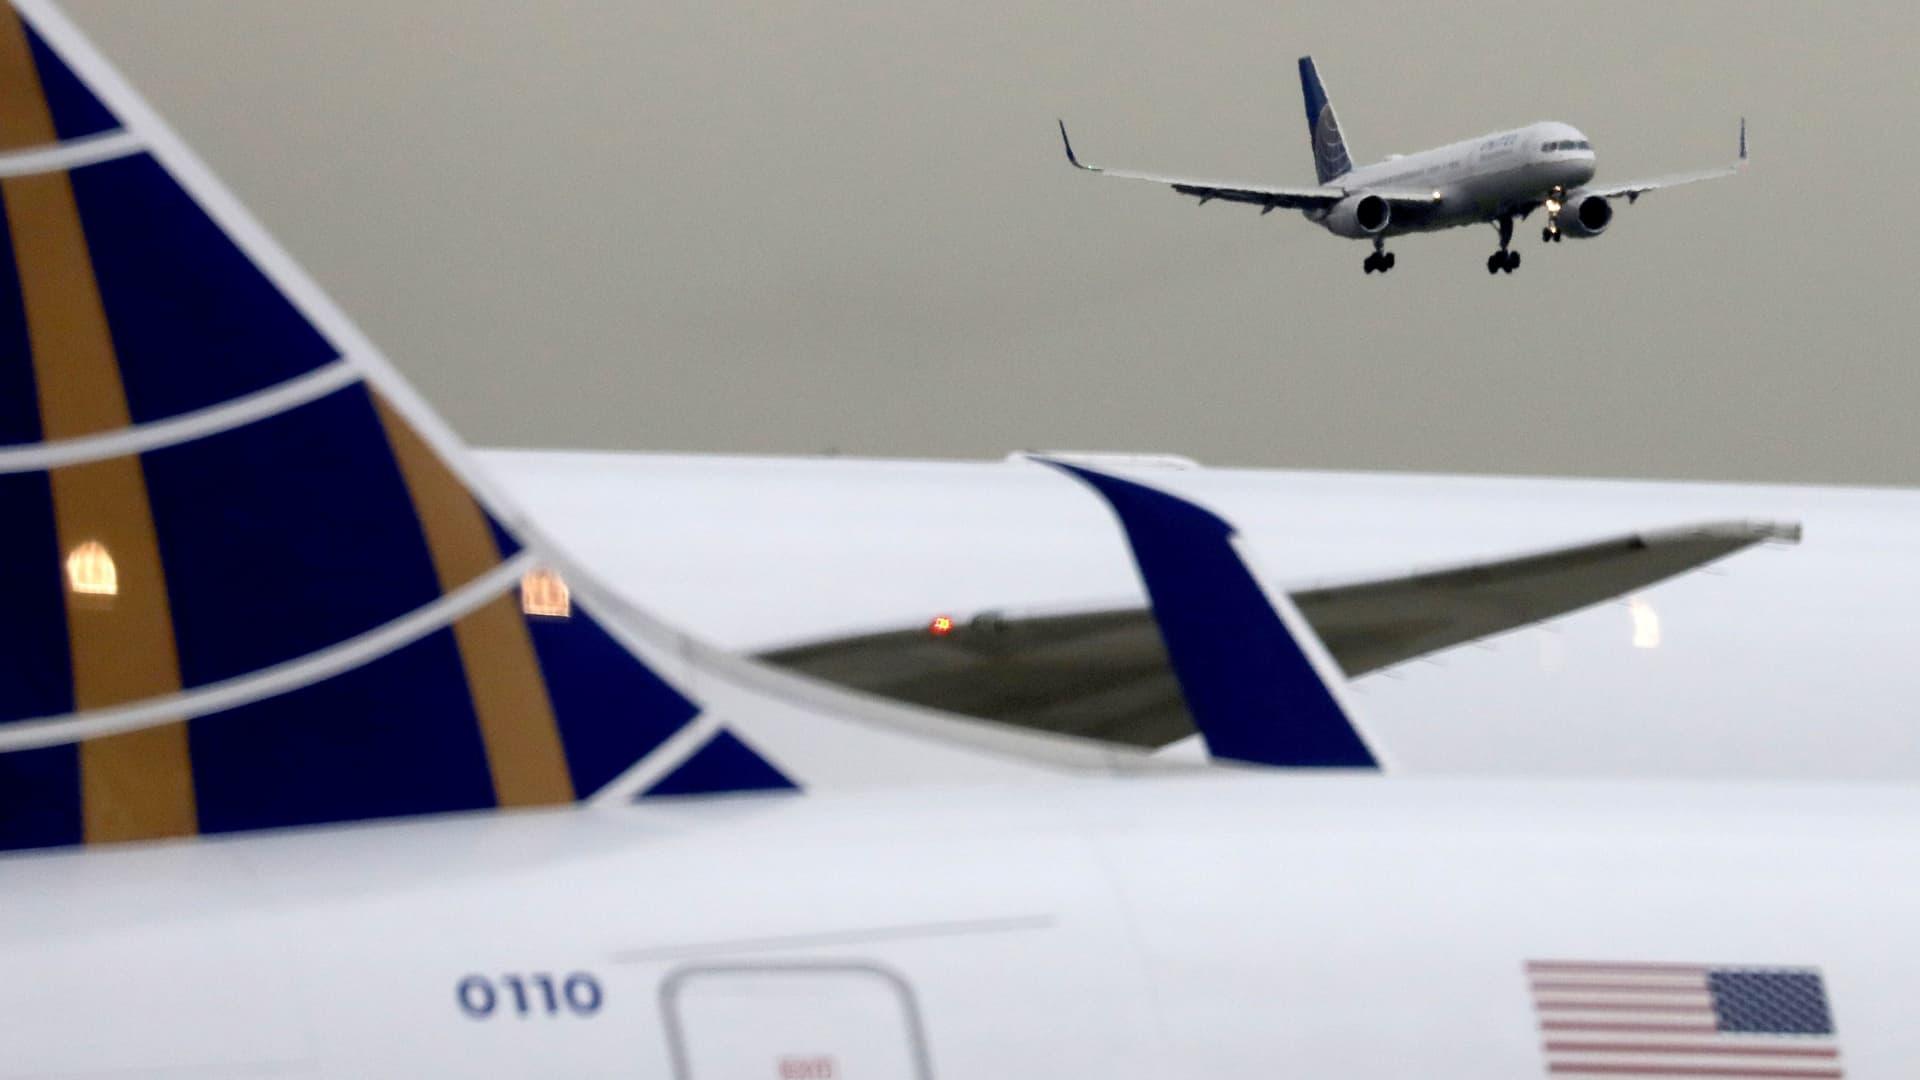 A United Airlines passenger jet lands at Newark Liberty International Airport, New Jersey, U.S. December 6, 2019.